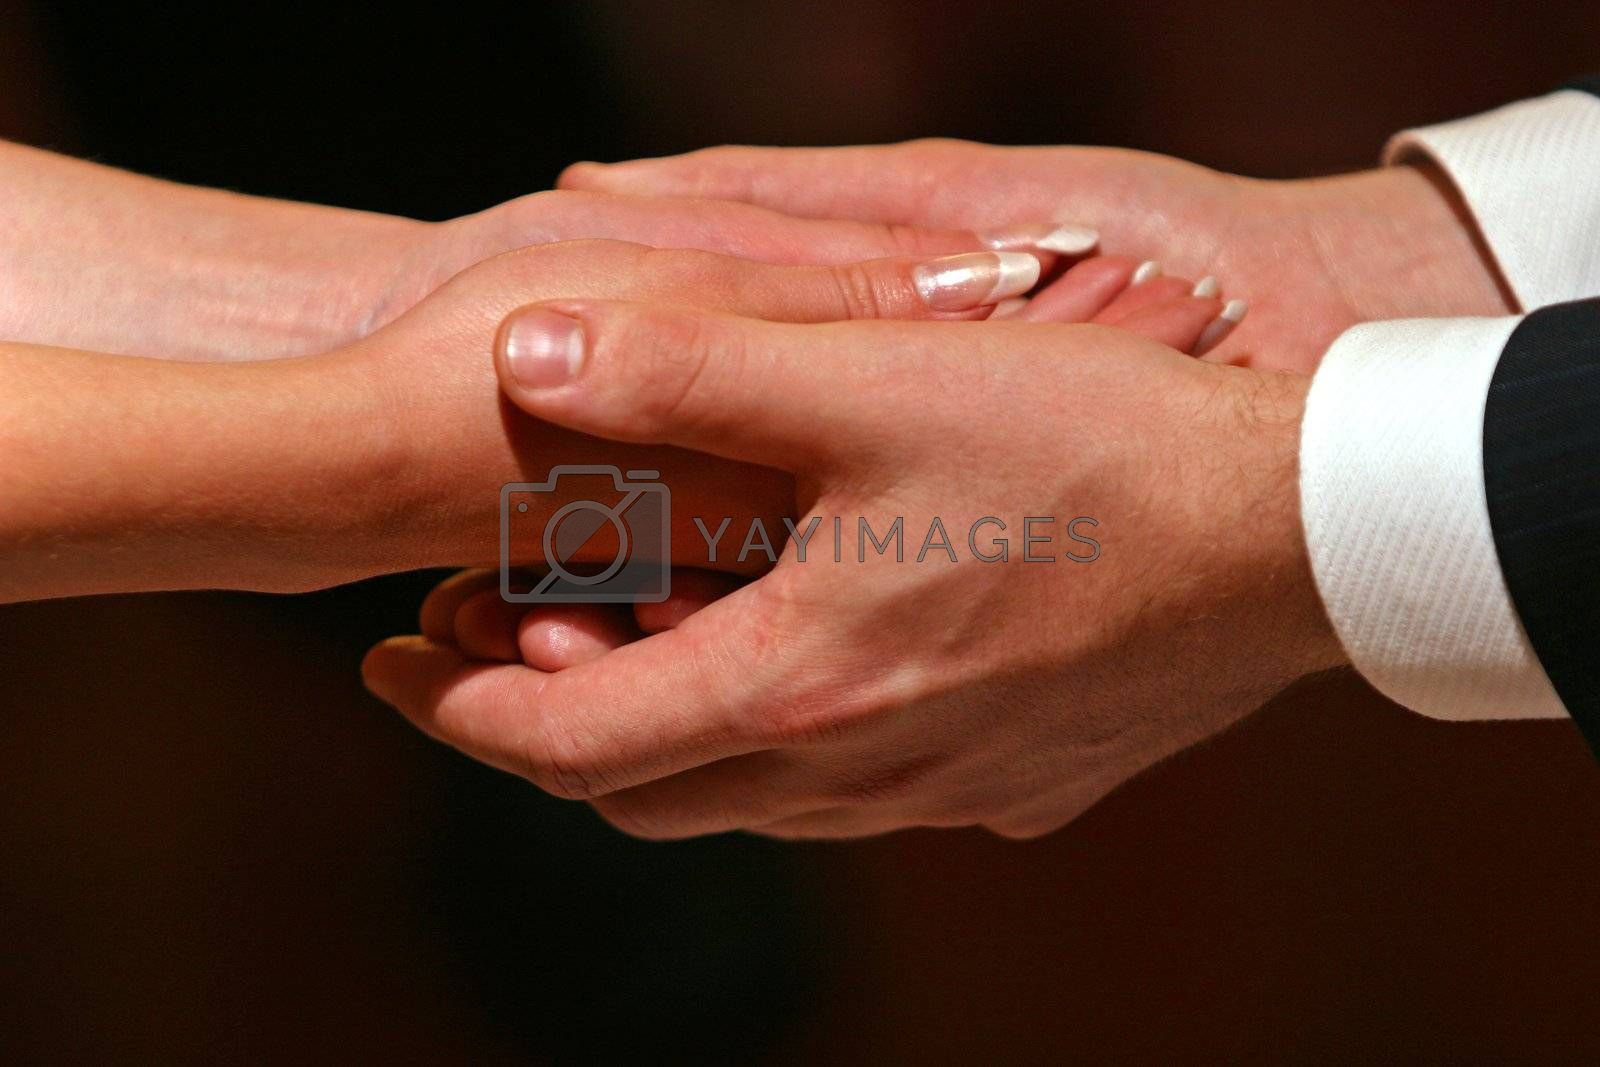 Female hands in man's hands on a dark background